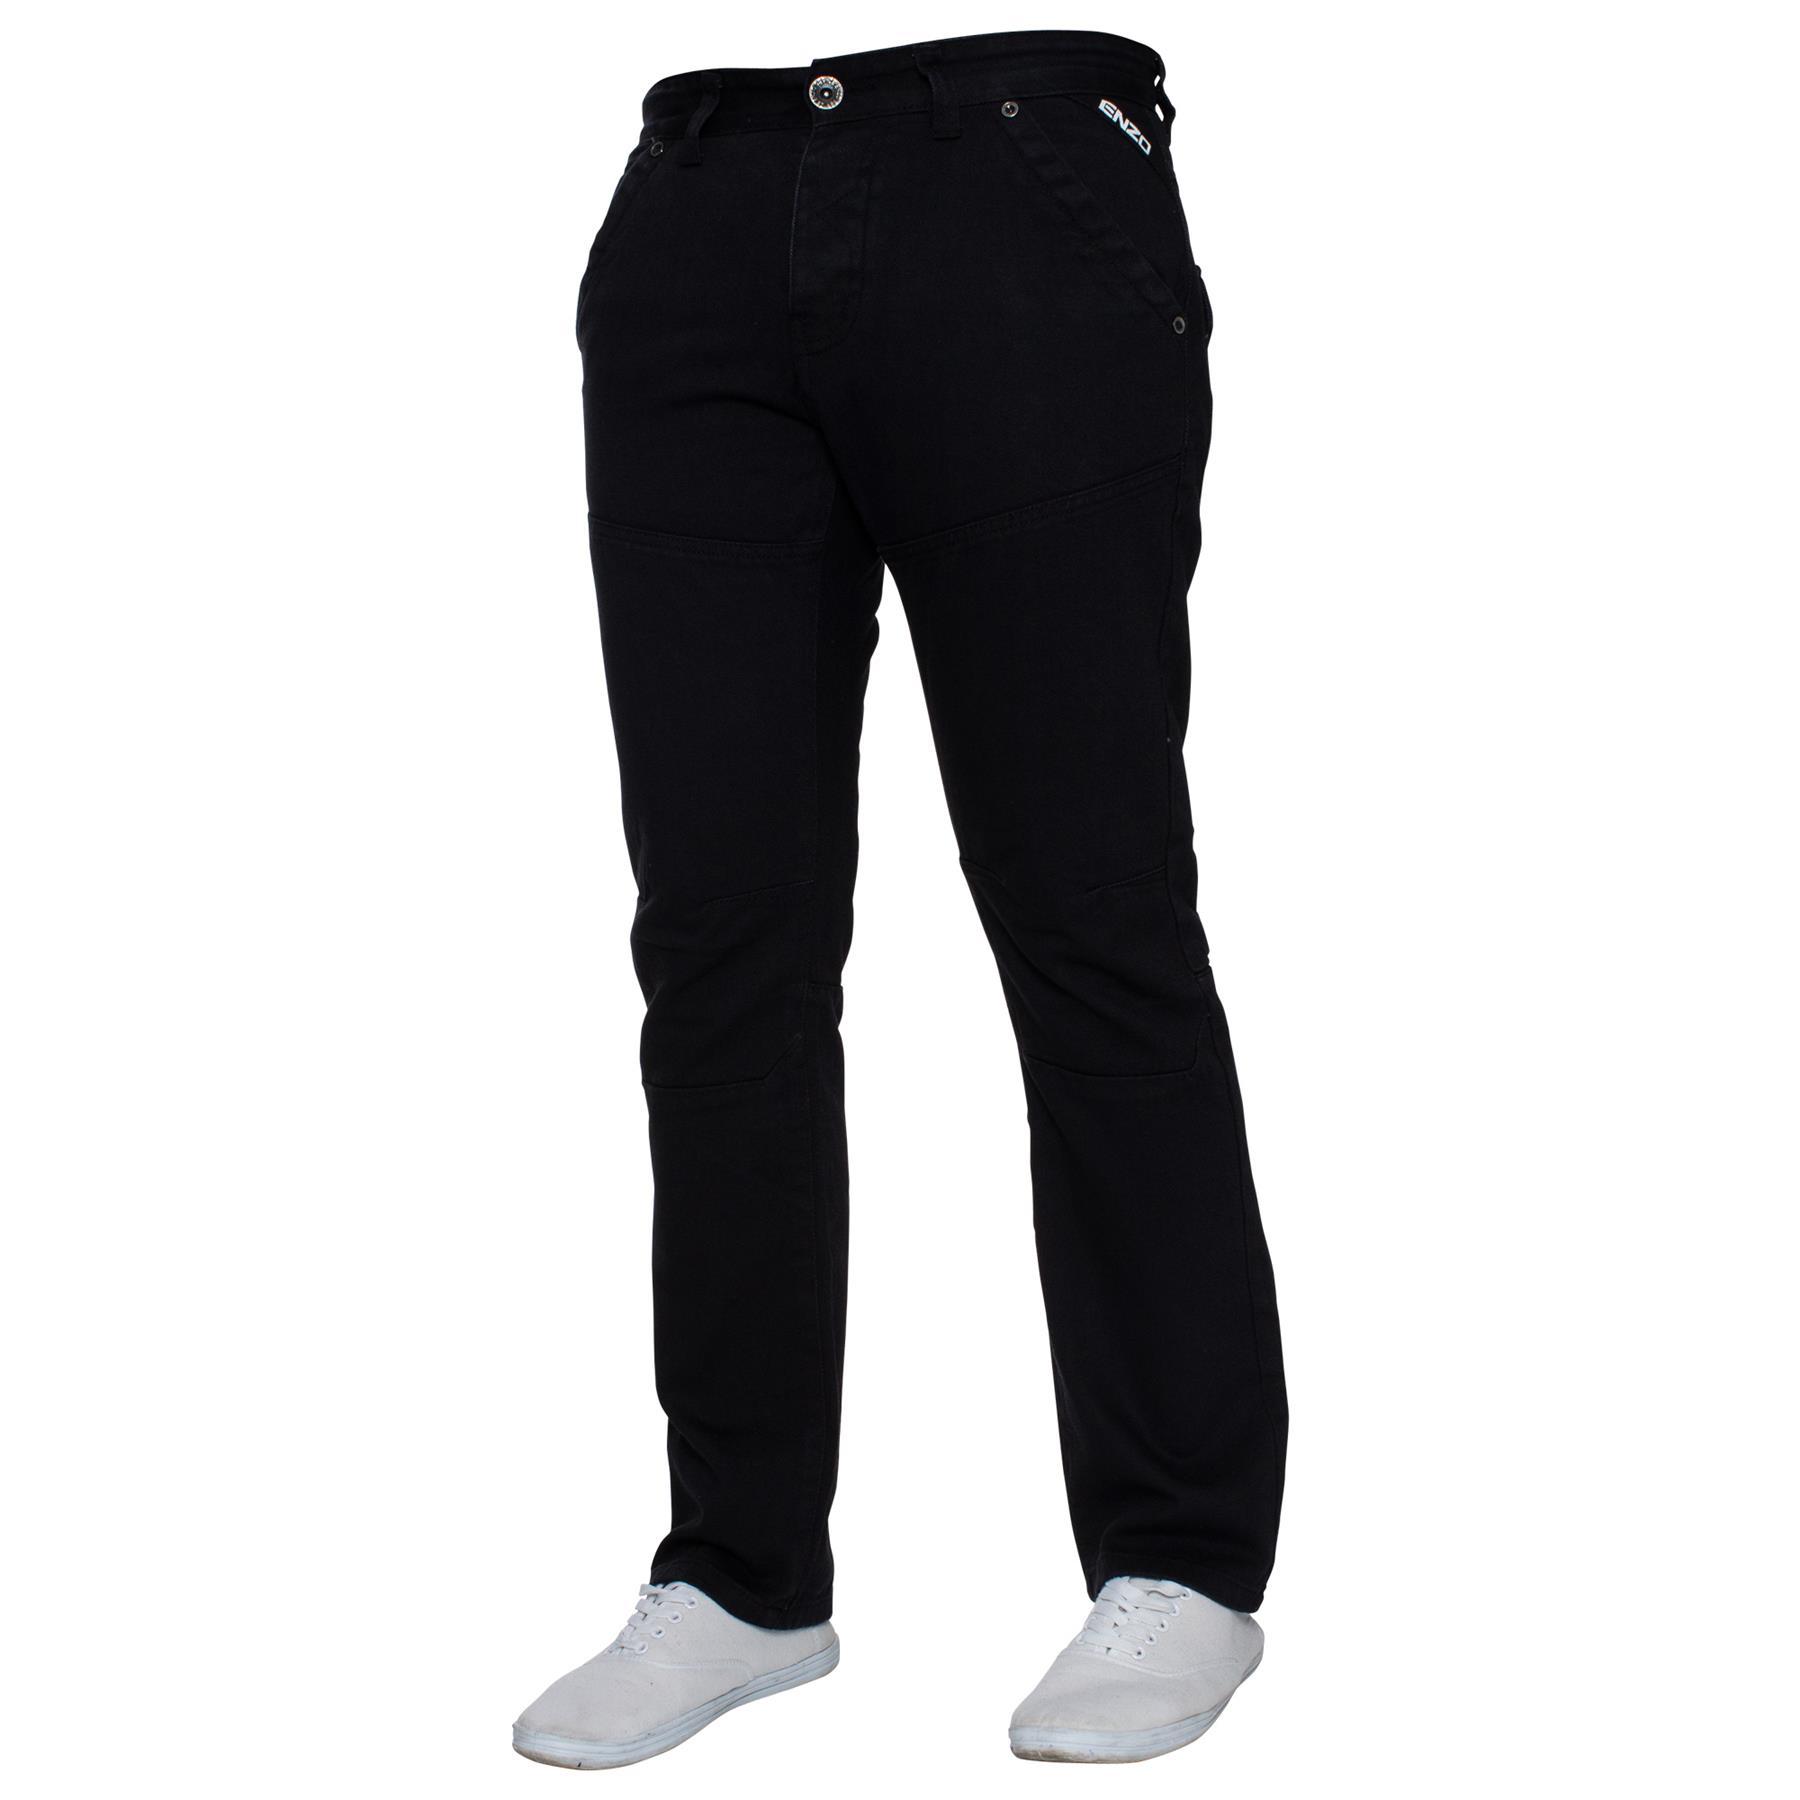 ENZO-Jeans-para-hombre-Big-Alto-Pierna-King-Size-Jeans-Pantalones-Chino-Pantalones-Pantalones-44-034 miniatura 51